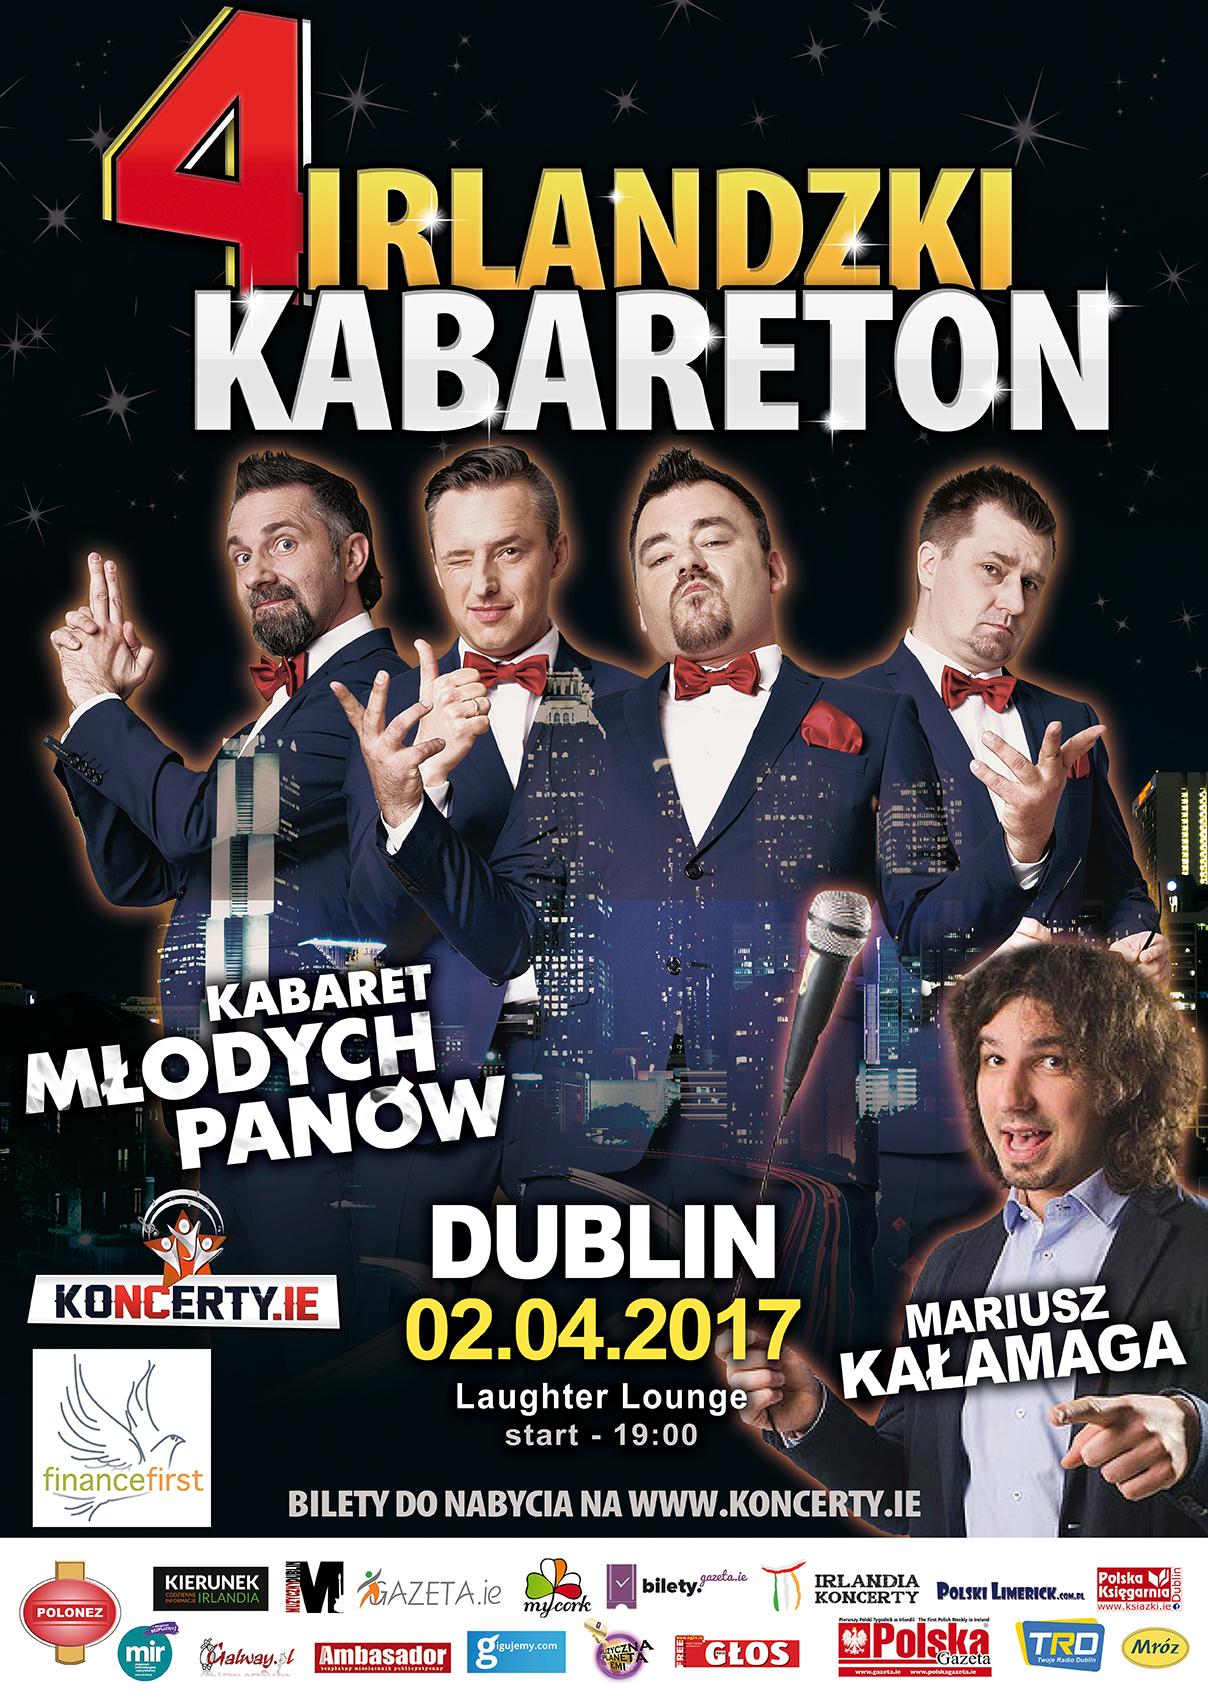 IV Irlandkzi Kabareton plakat A2 dublin (3)